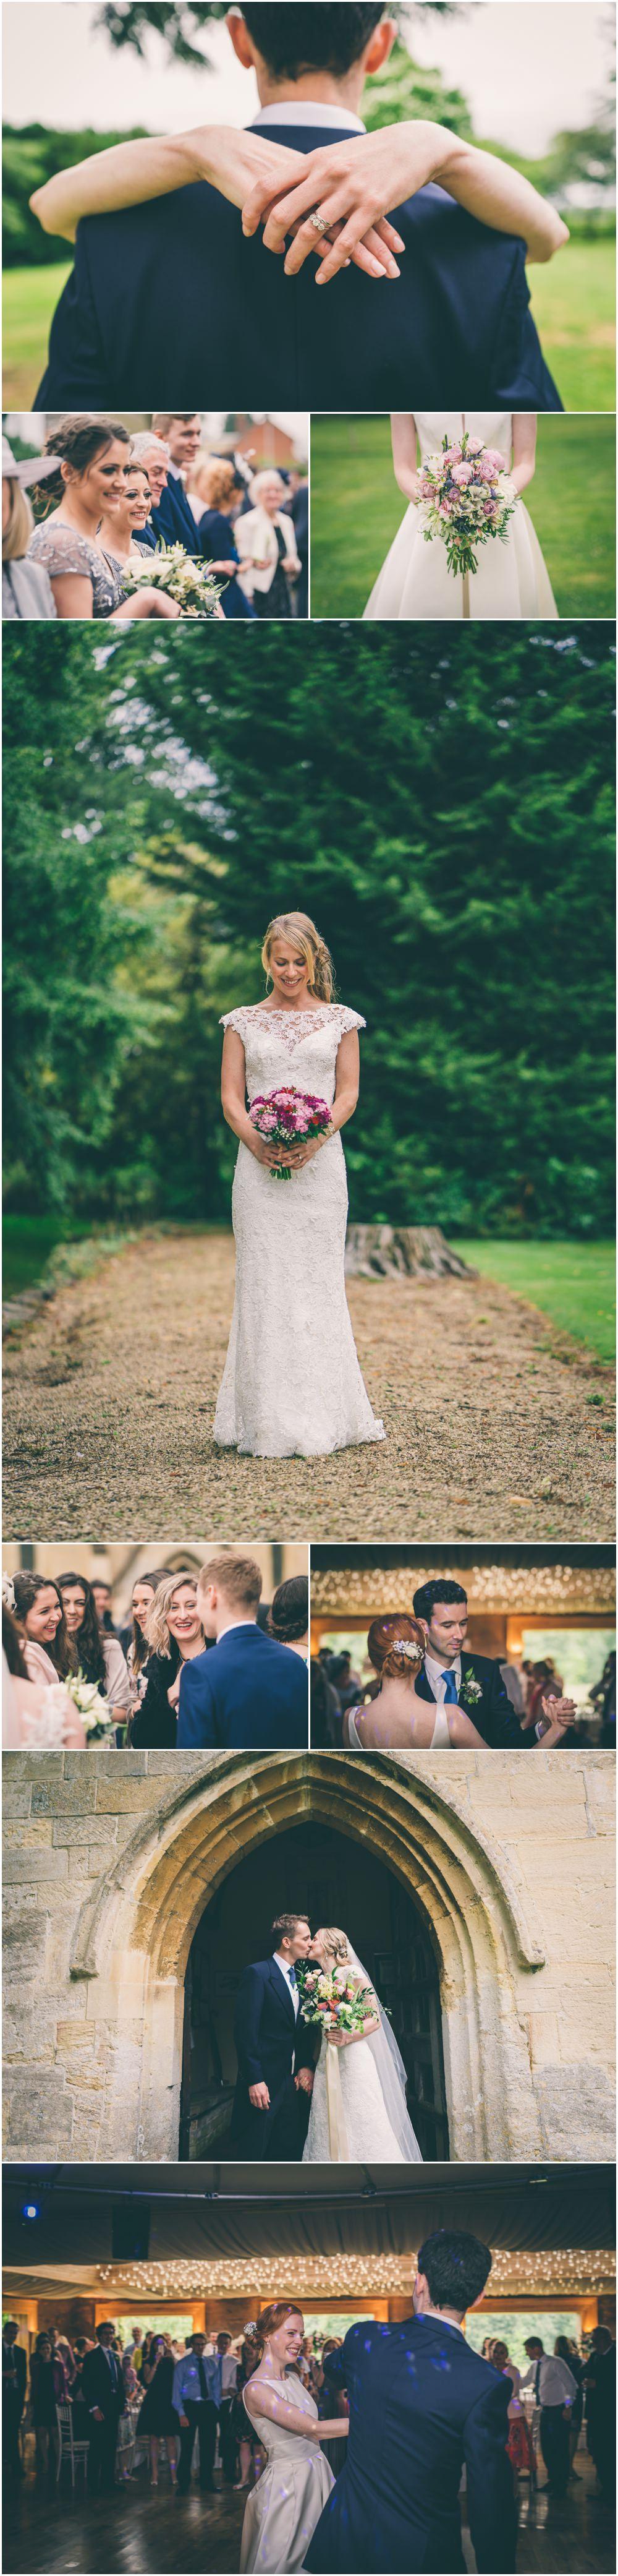 Rob Tarren Wedding Photography